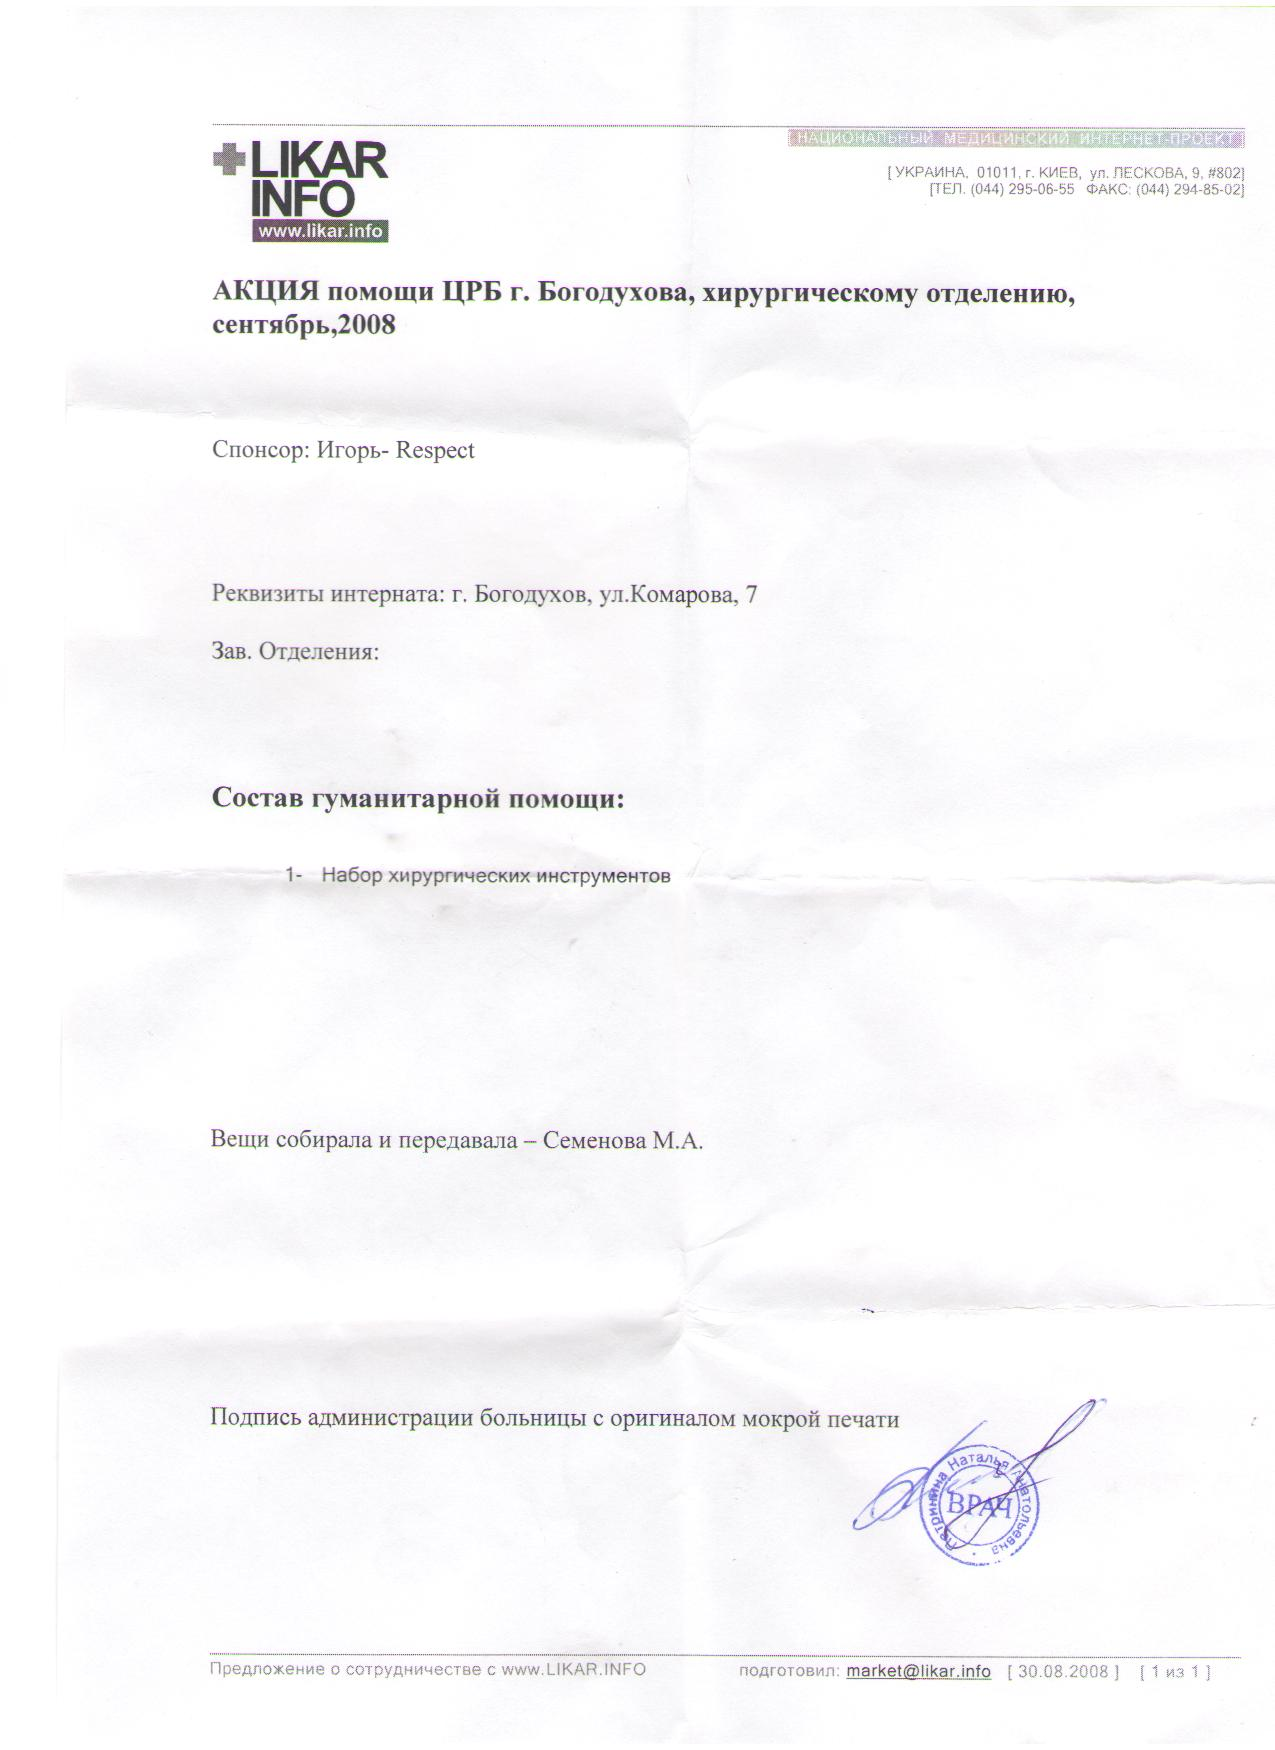 LIKAR.INFUND помощь ЦРБ г.Боодухов хирургия